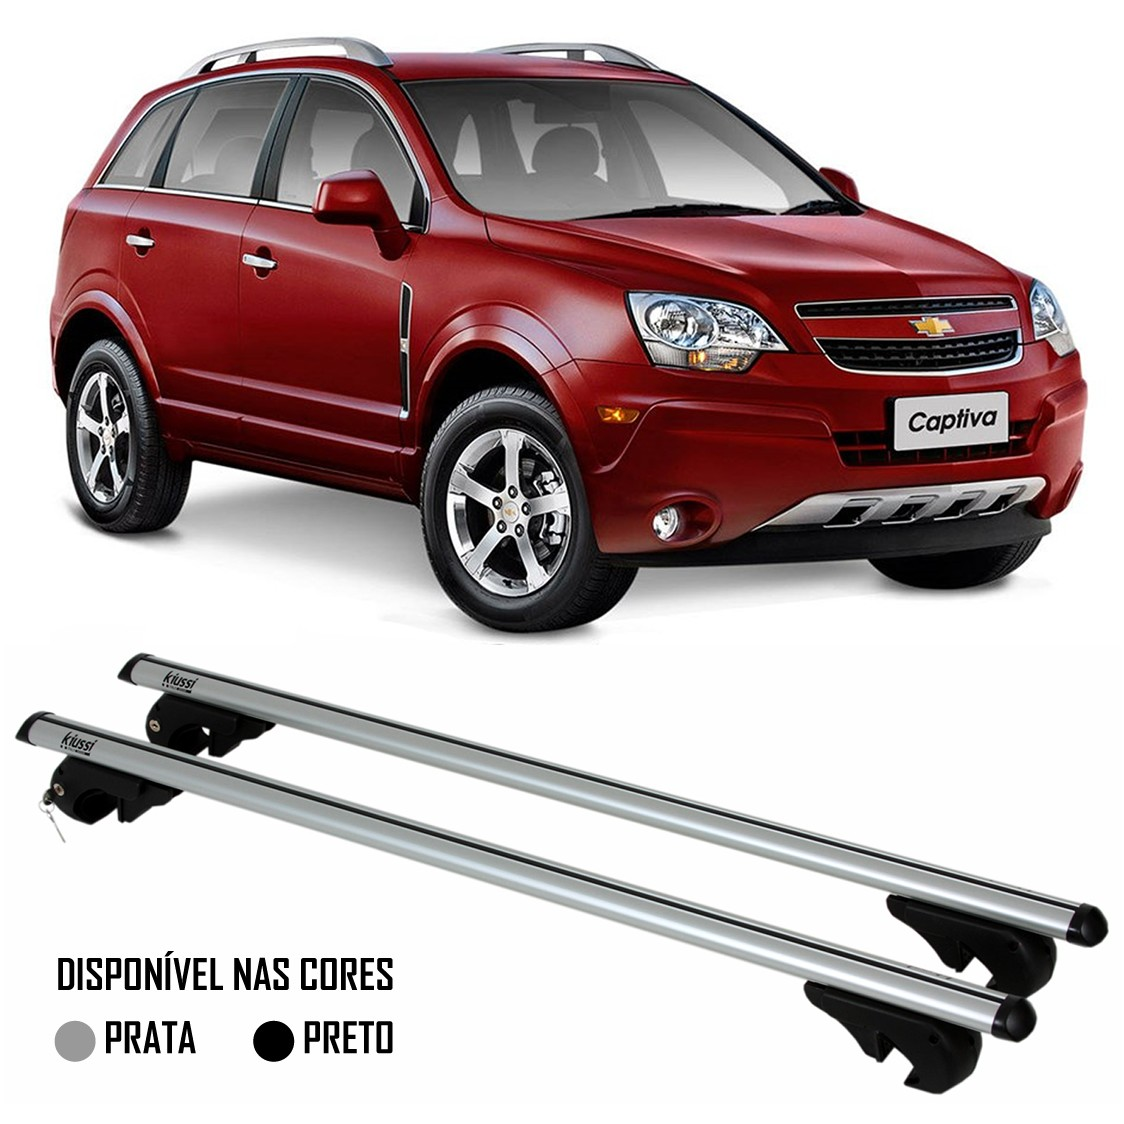 Rack Travessa Chevrolet Captiva 2007 2008 2009 2010 2011 2012 2013 2014 2015 - Kiussi Alumínio Com Chave 50KG - Preto / Prata